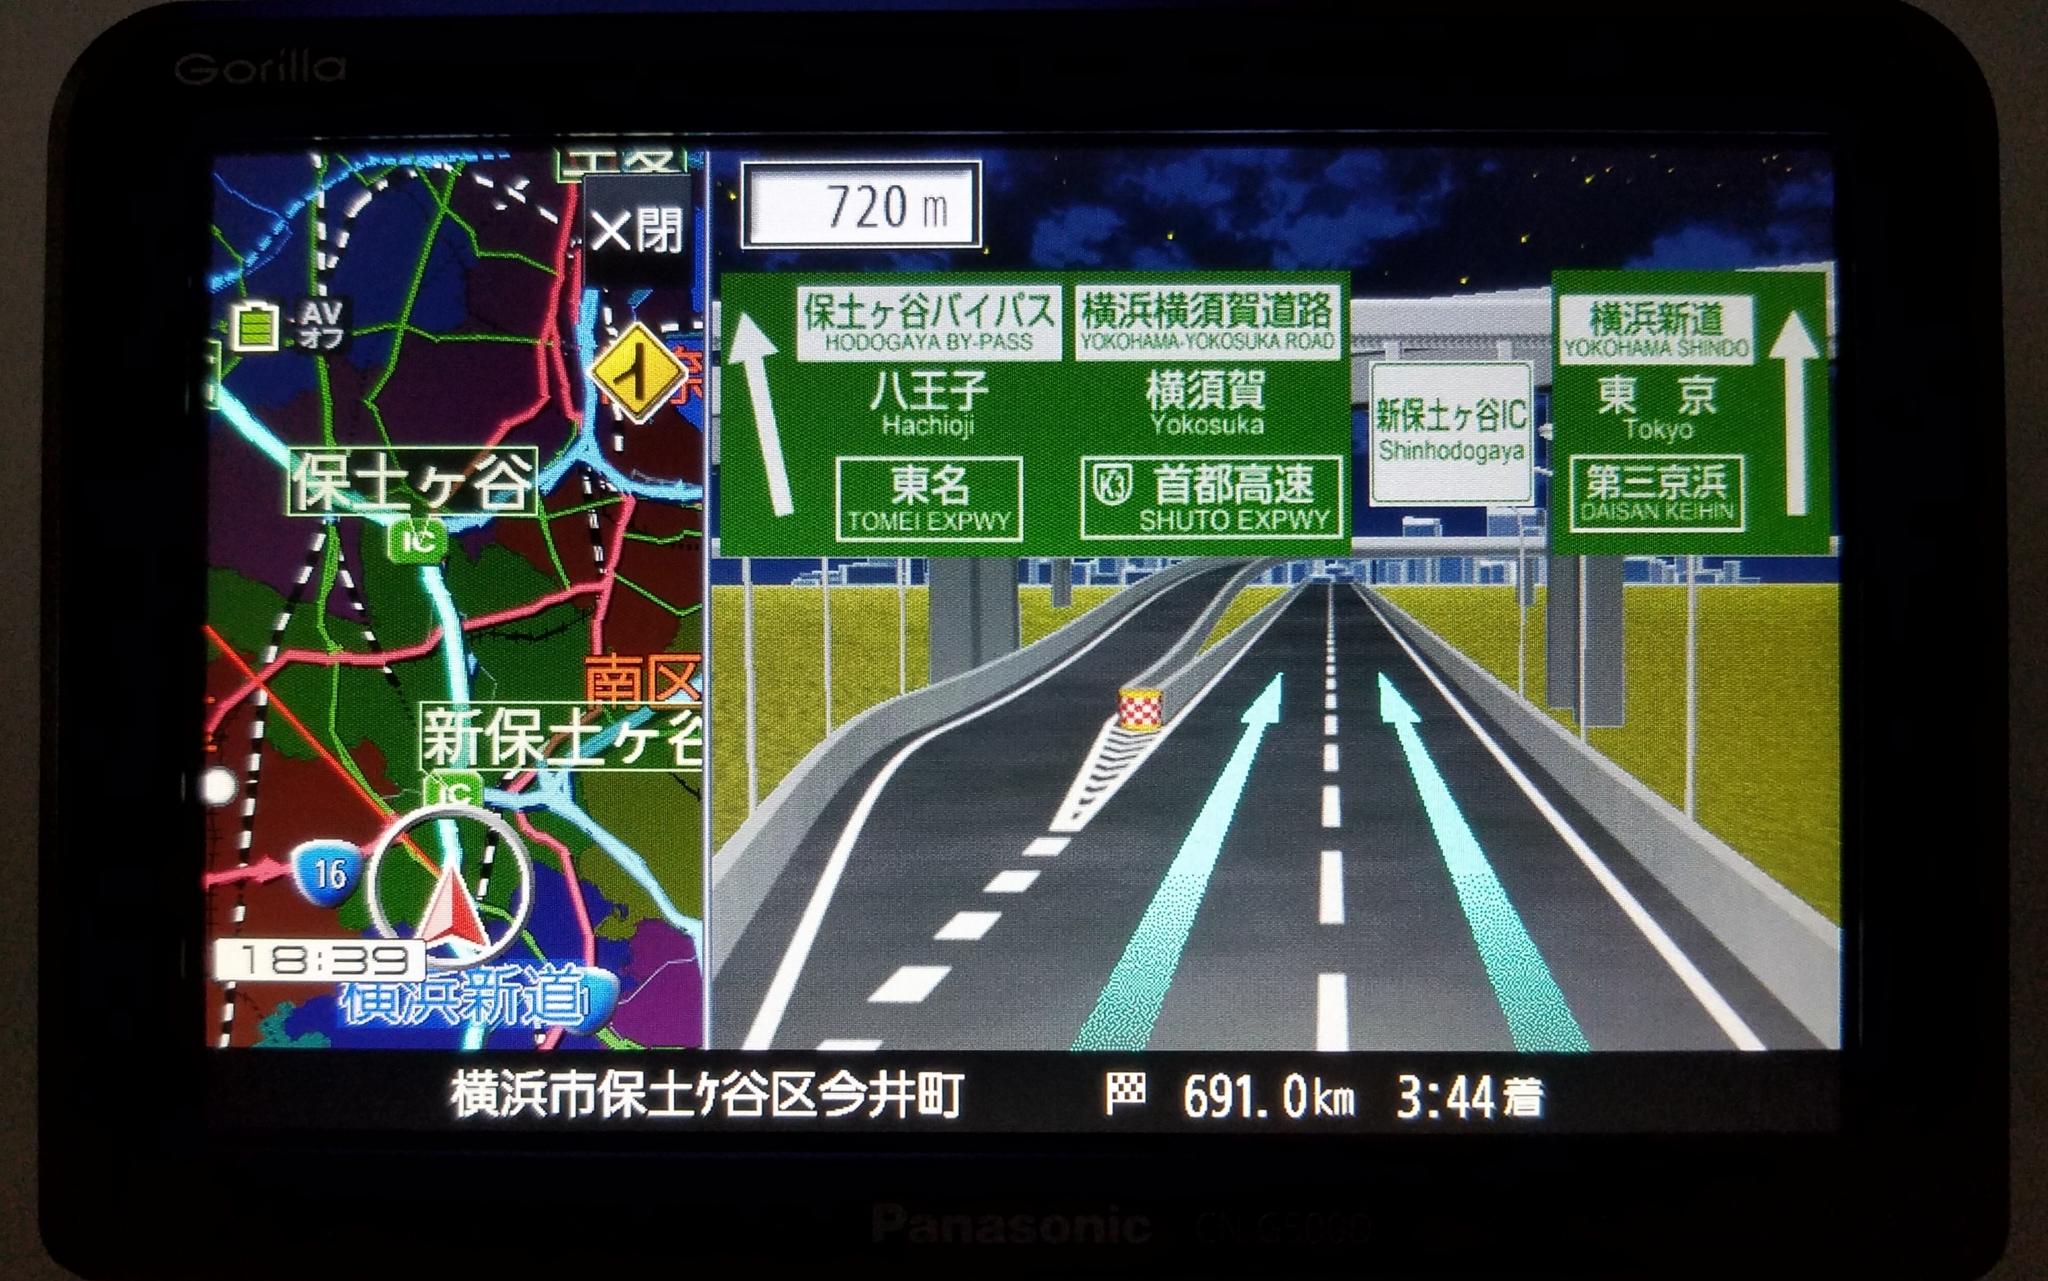 f:id:ToshUeno:20160925183929j:plain